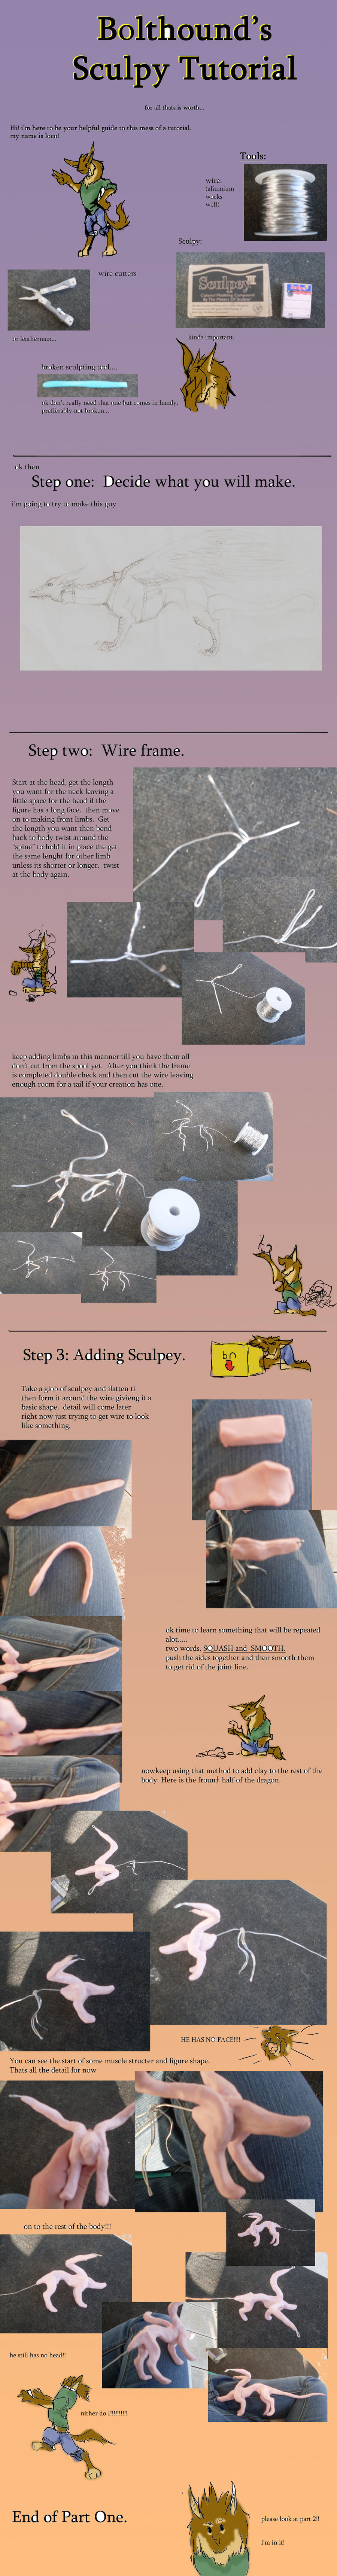 sculpey tutorial part 1 by bolthound